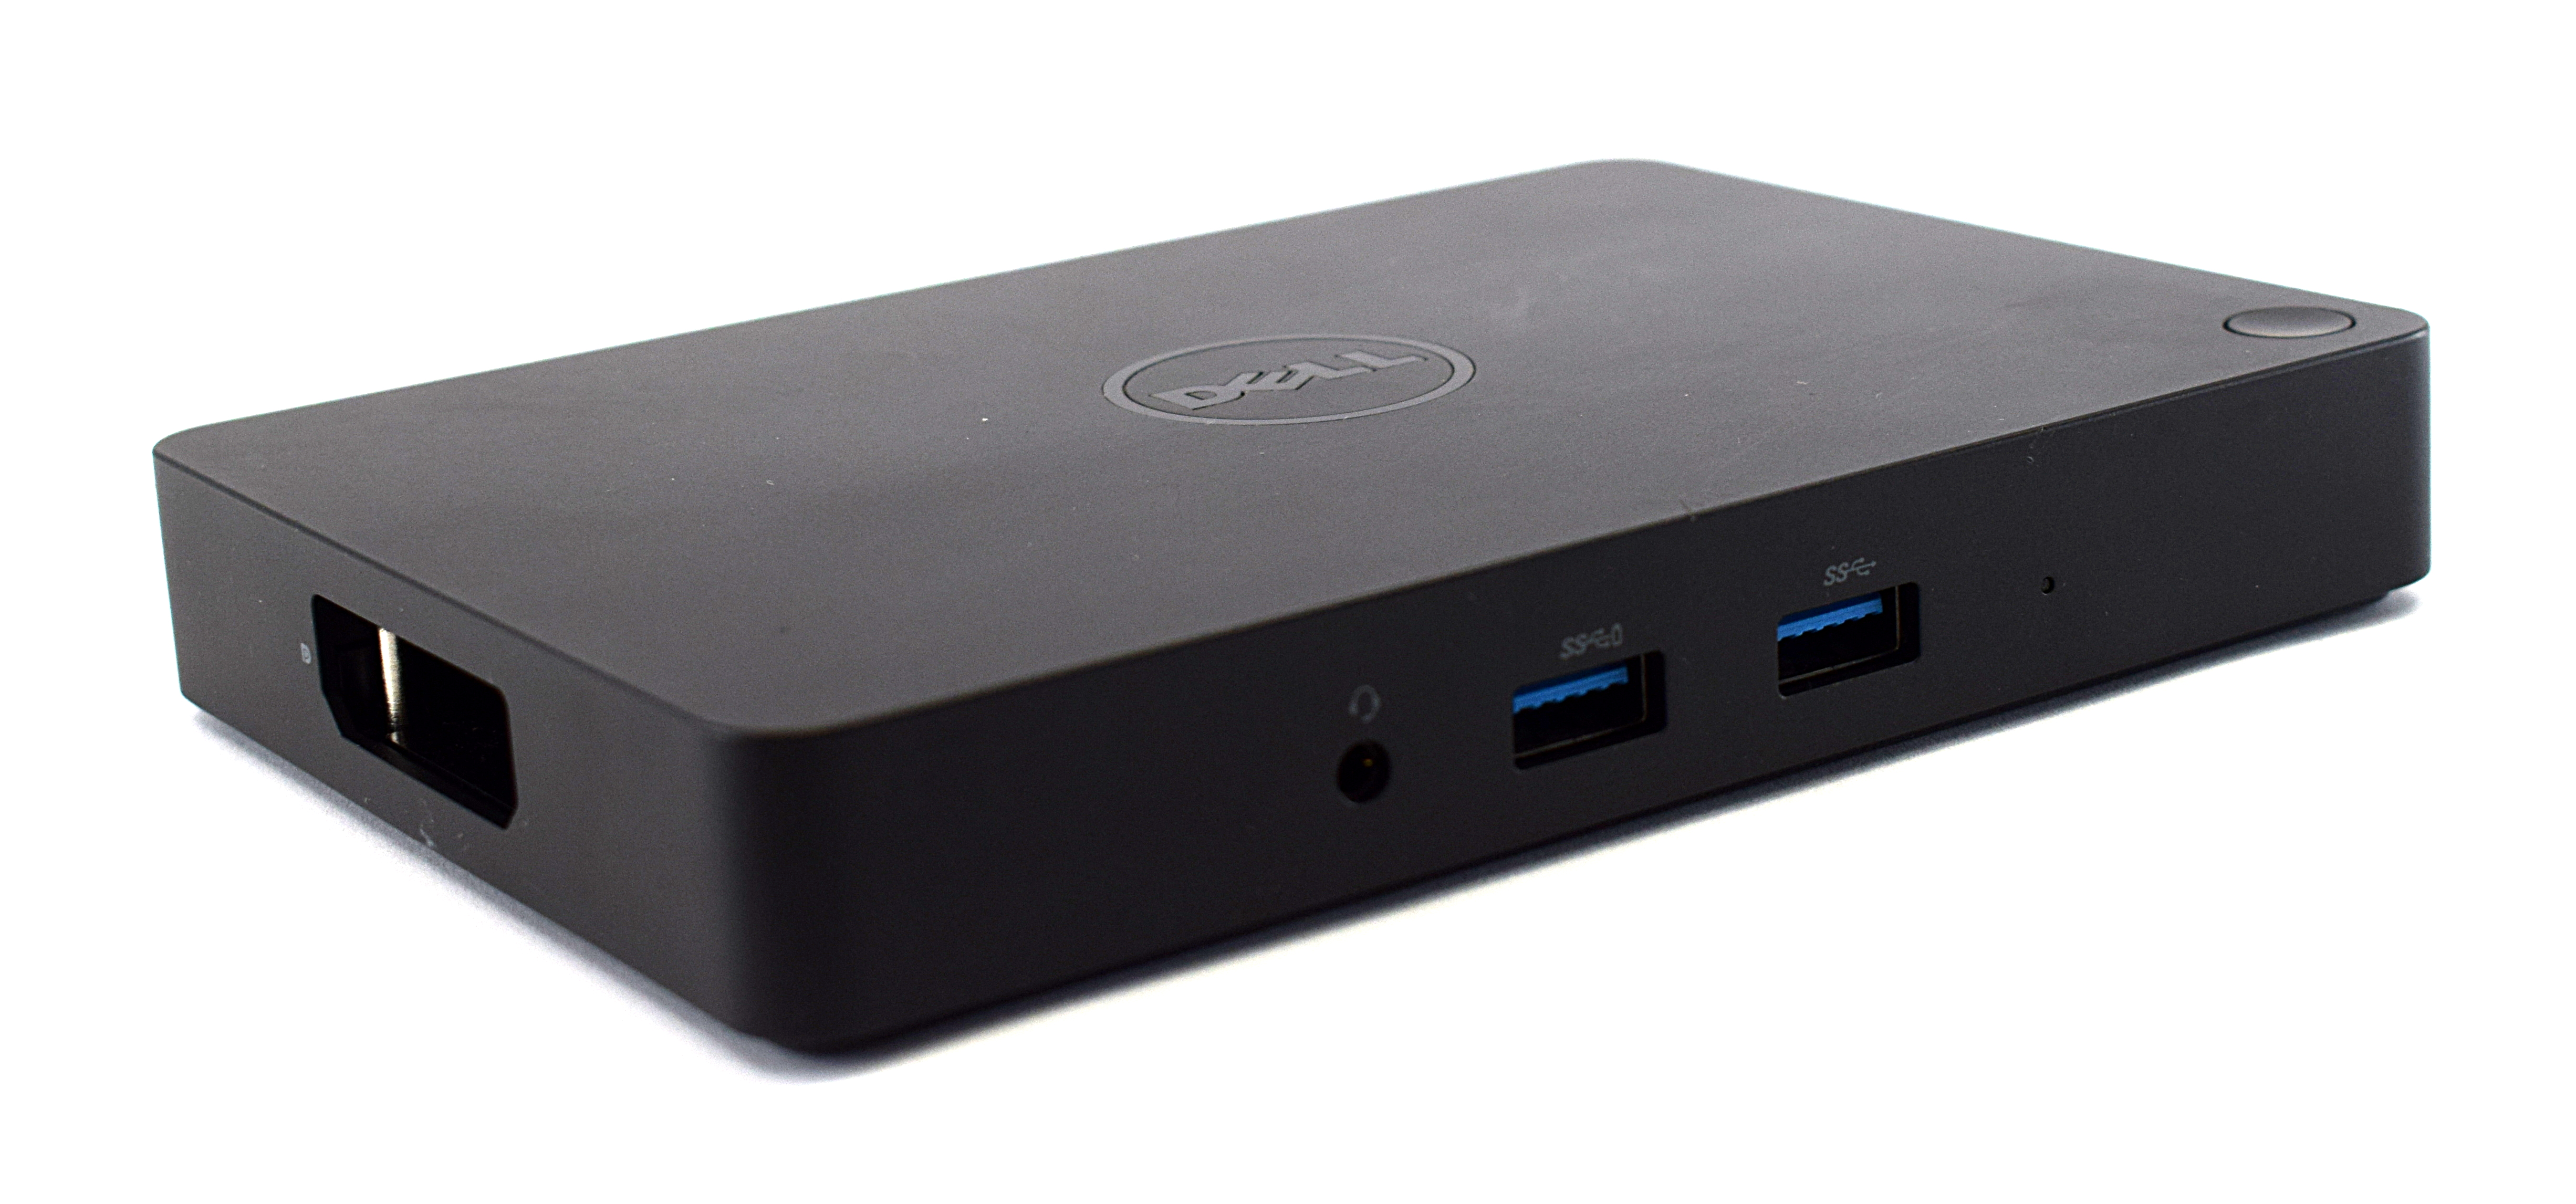 Dell 5FDDV USB Type-C Docking Station Port Replicator - No AC - No USB Cable